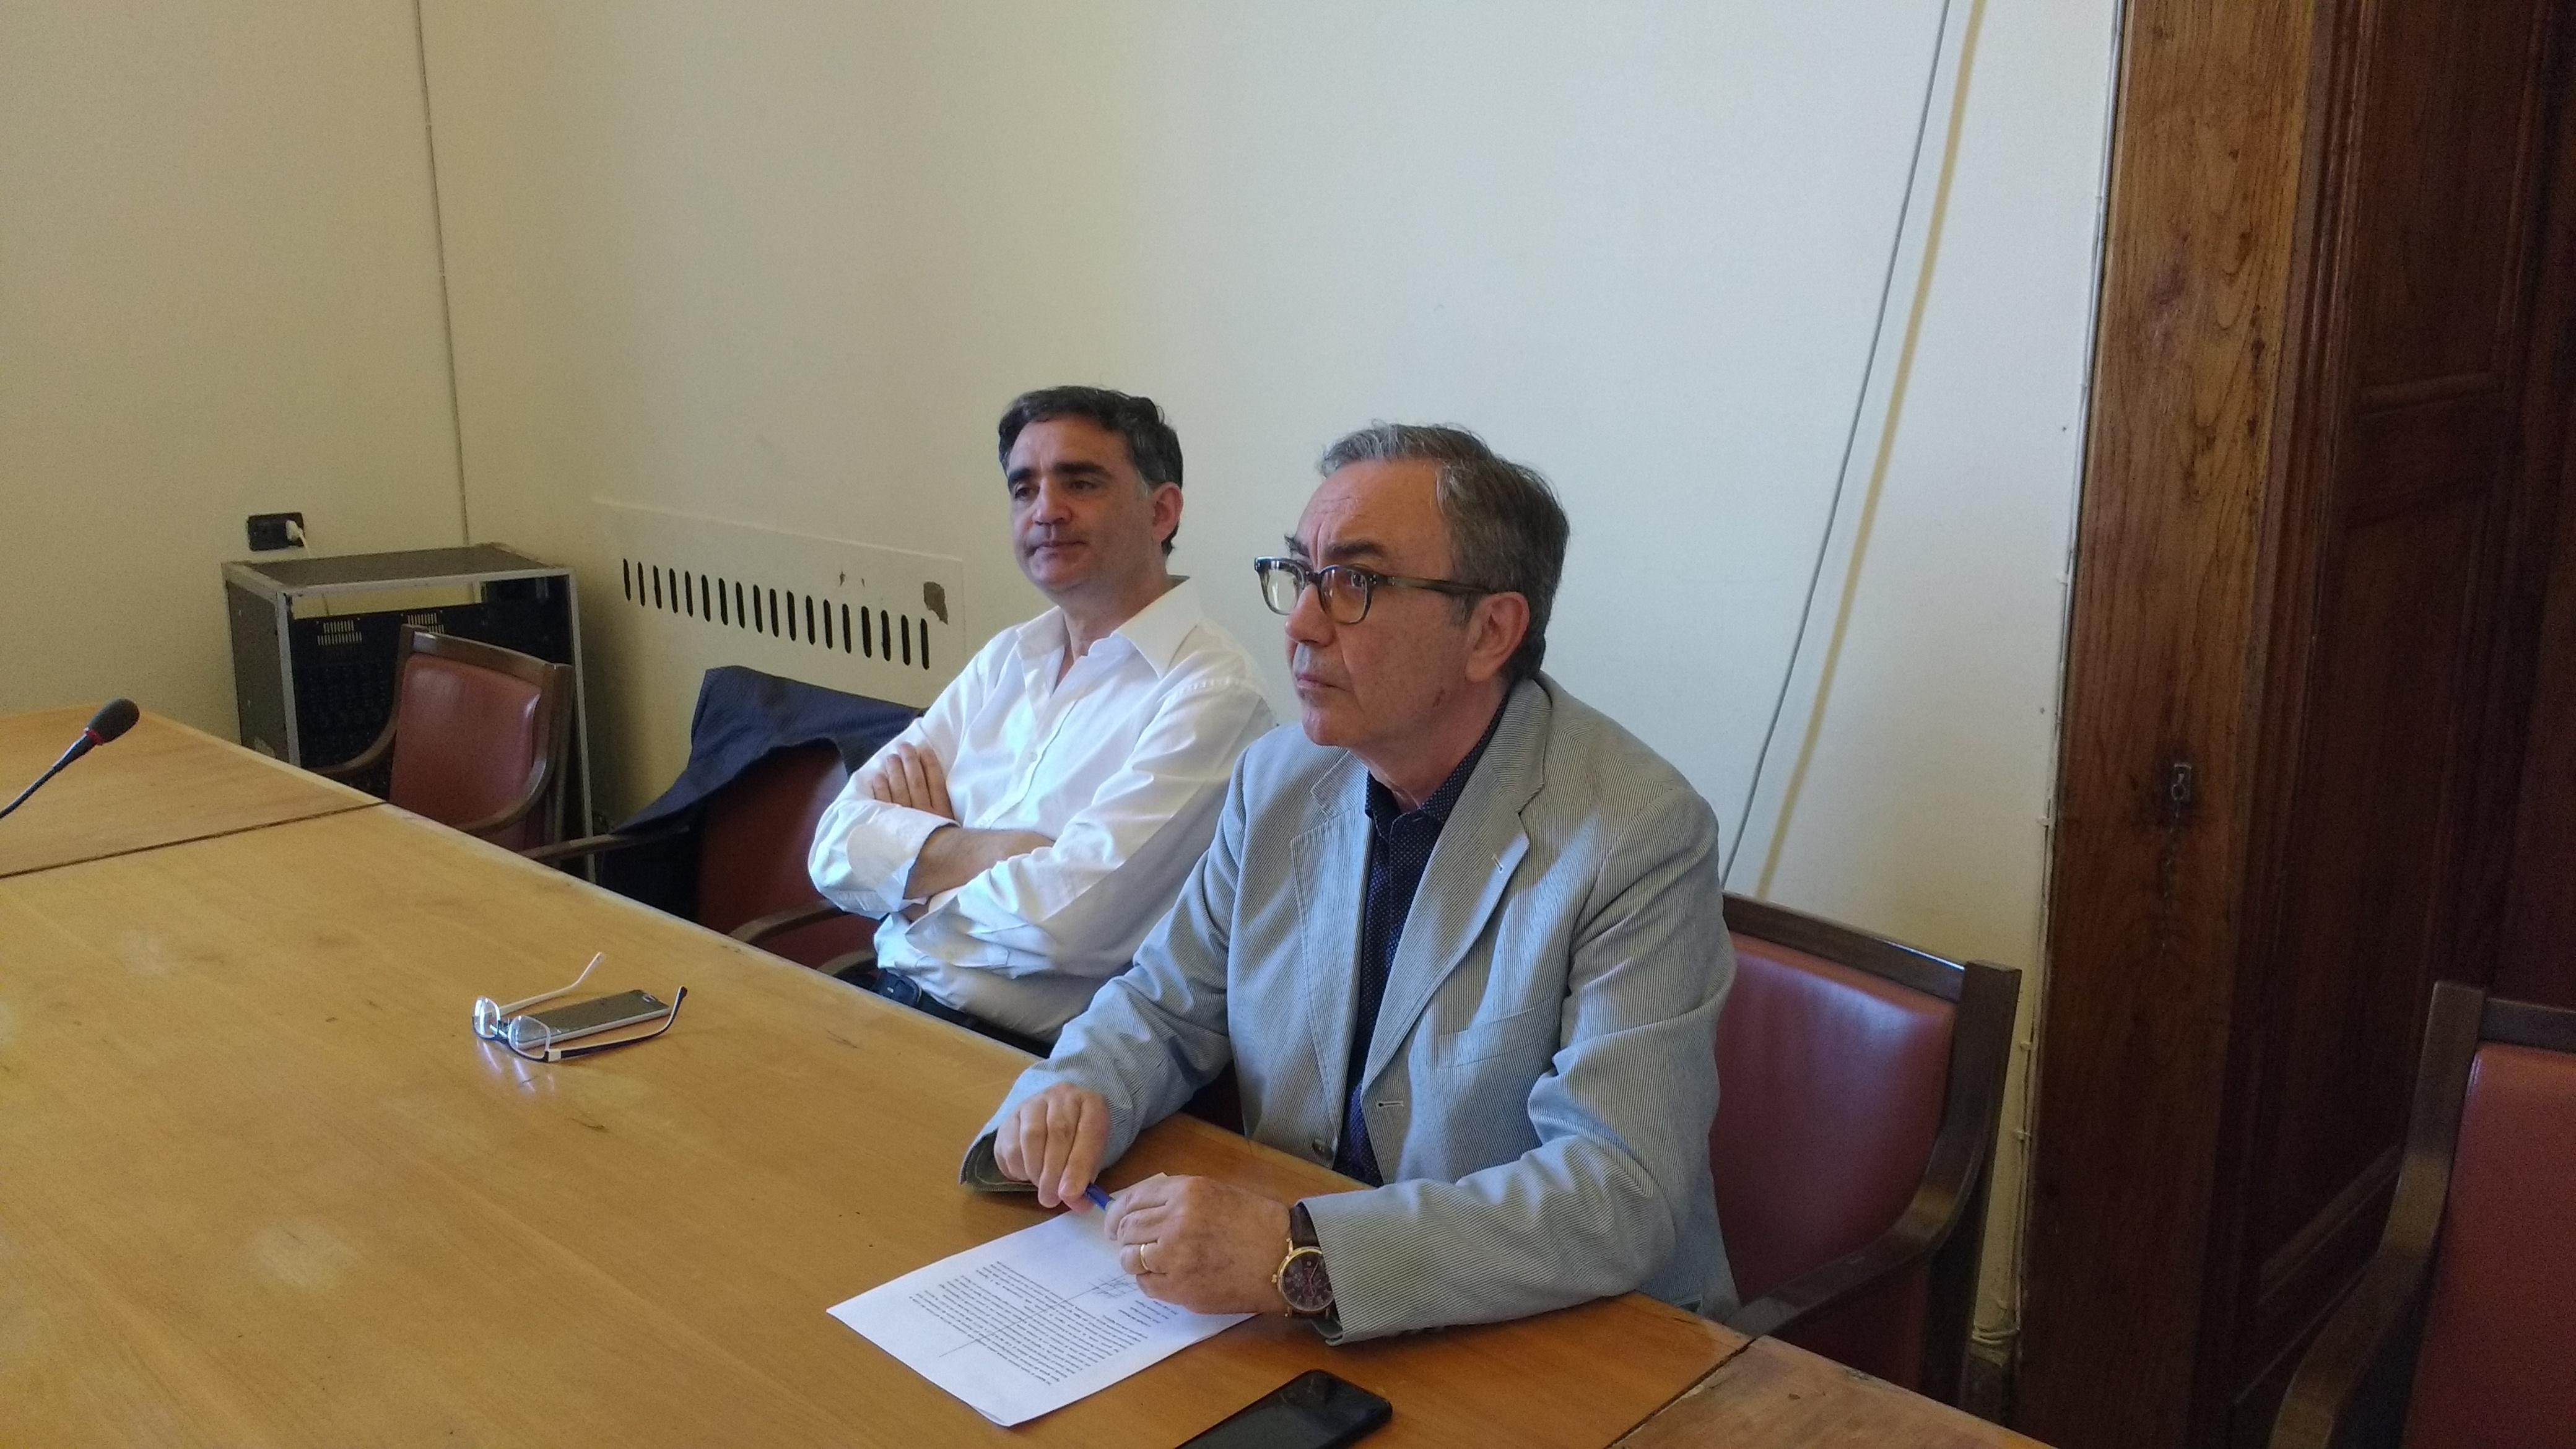 Visibilità G7 lesa per Messina, Trischitta: Perso spot mondiale